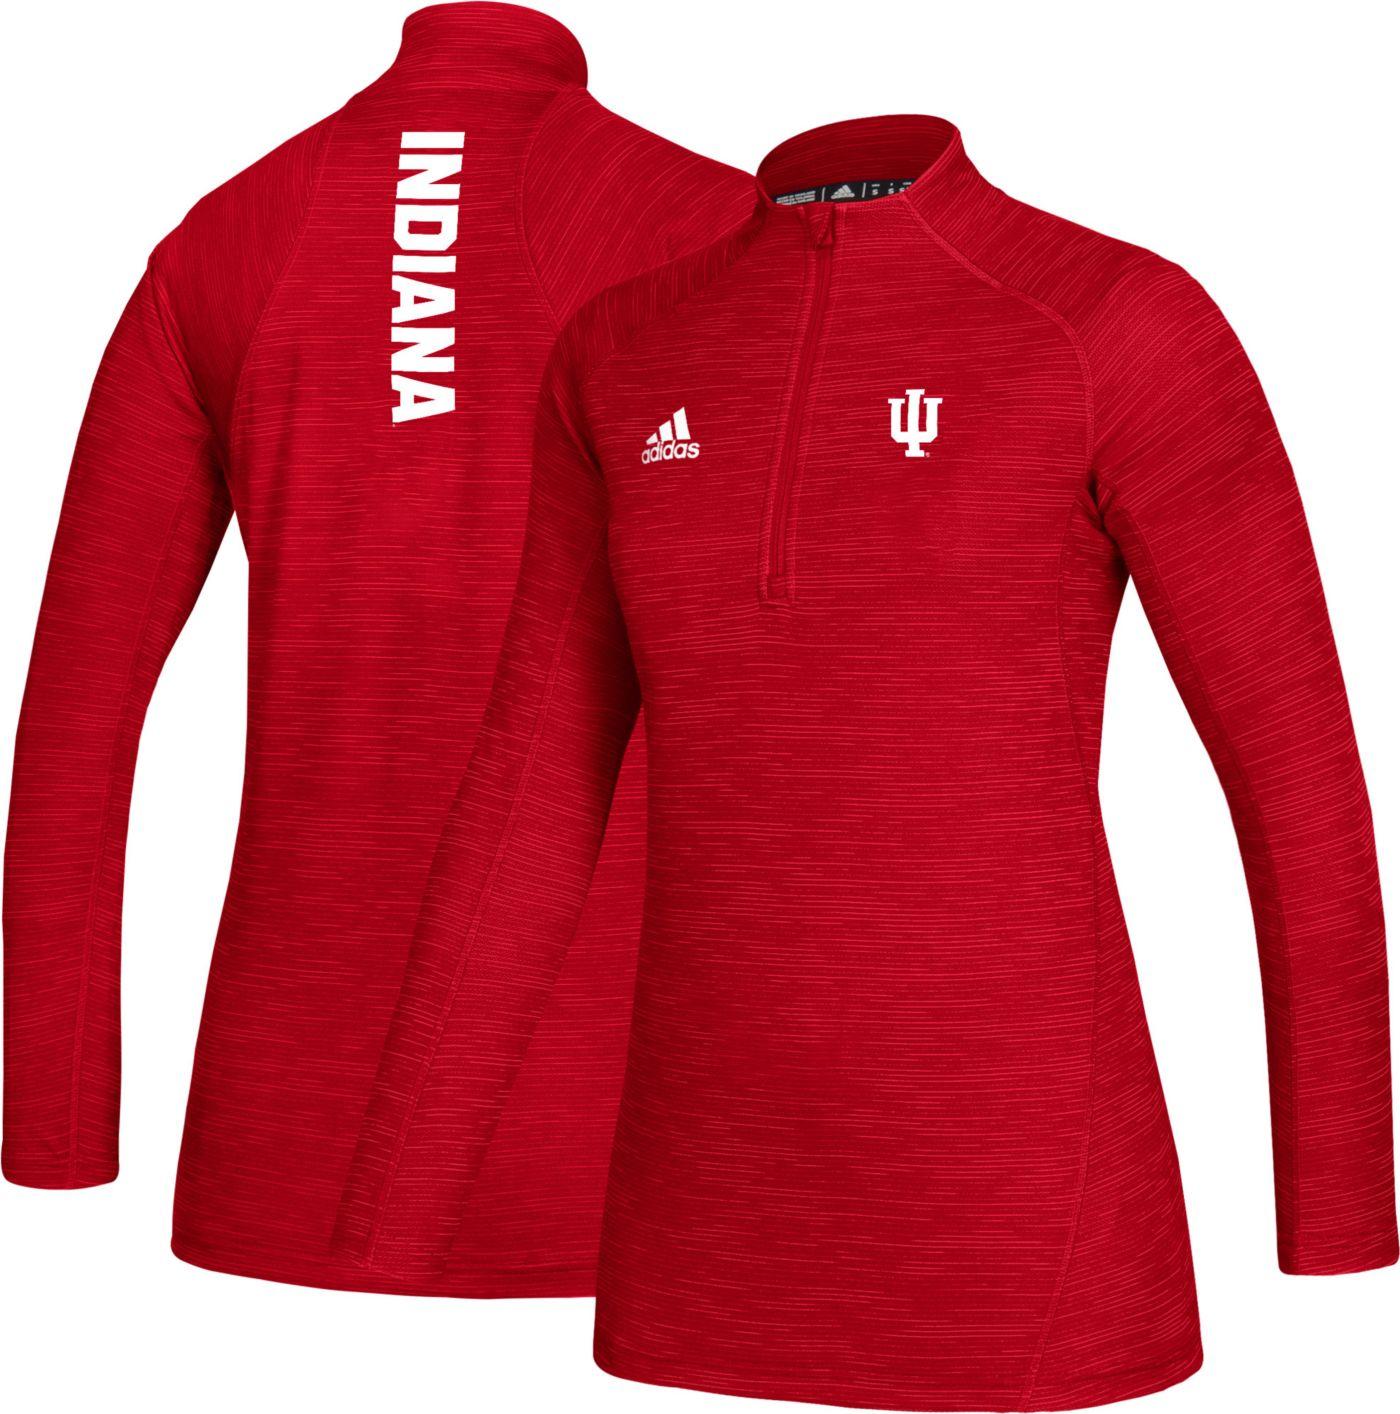 adidas Women's Indiana Hoosiers Crimson Game Mode Sideline Quarter-Zip Shirt